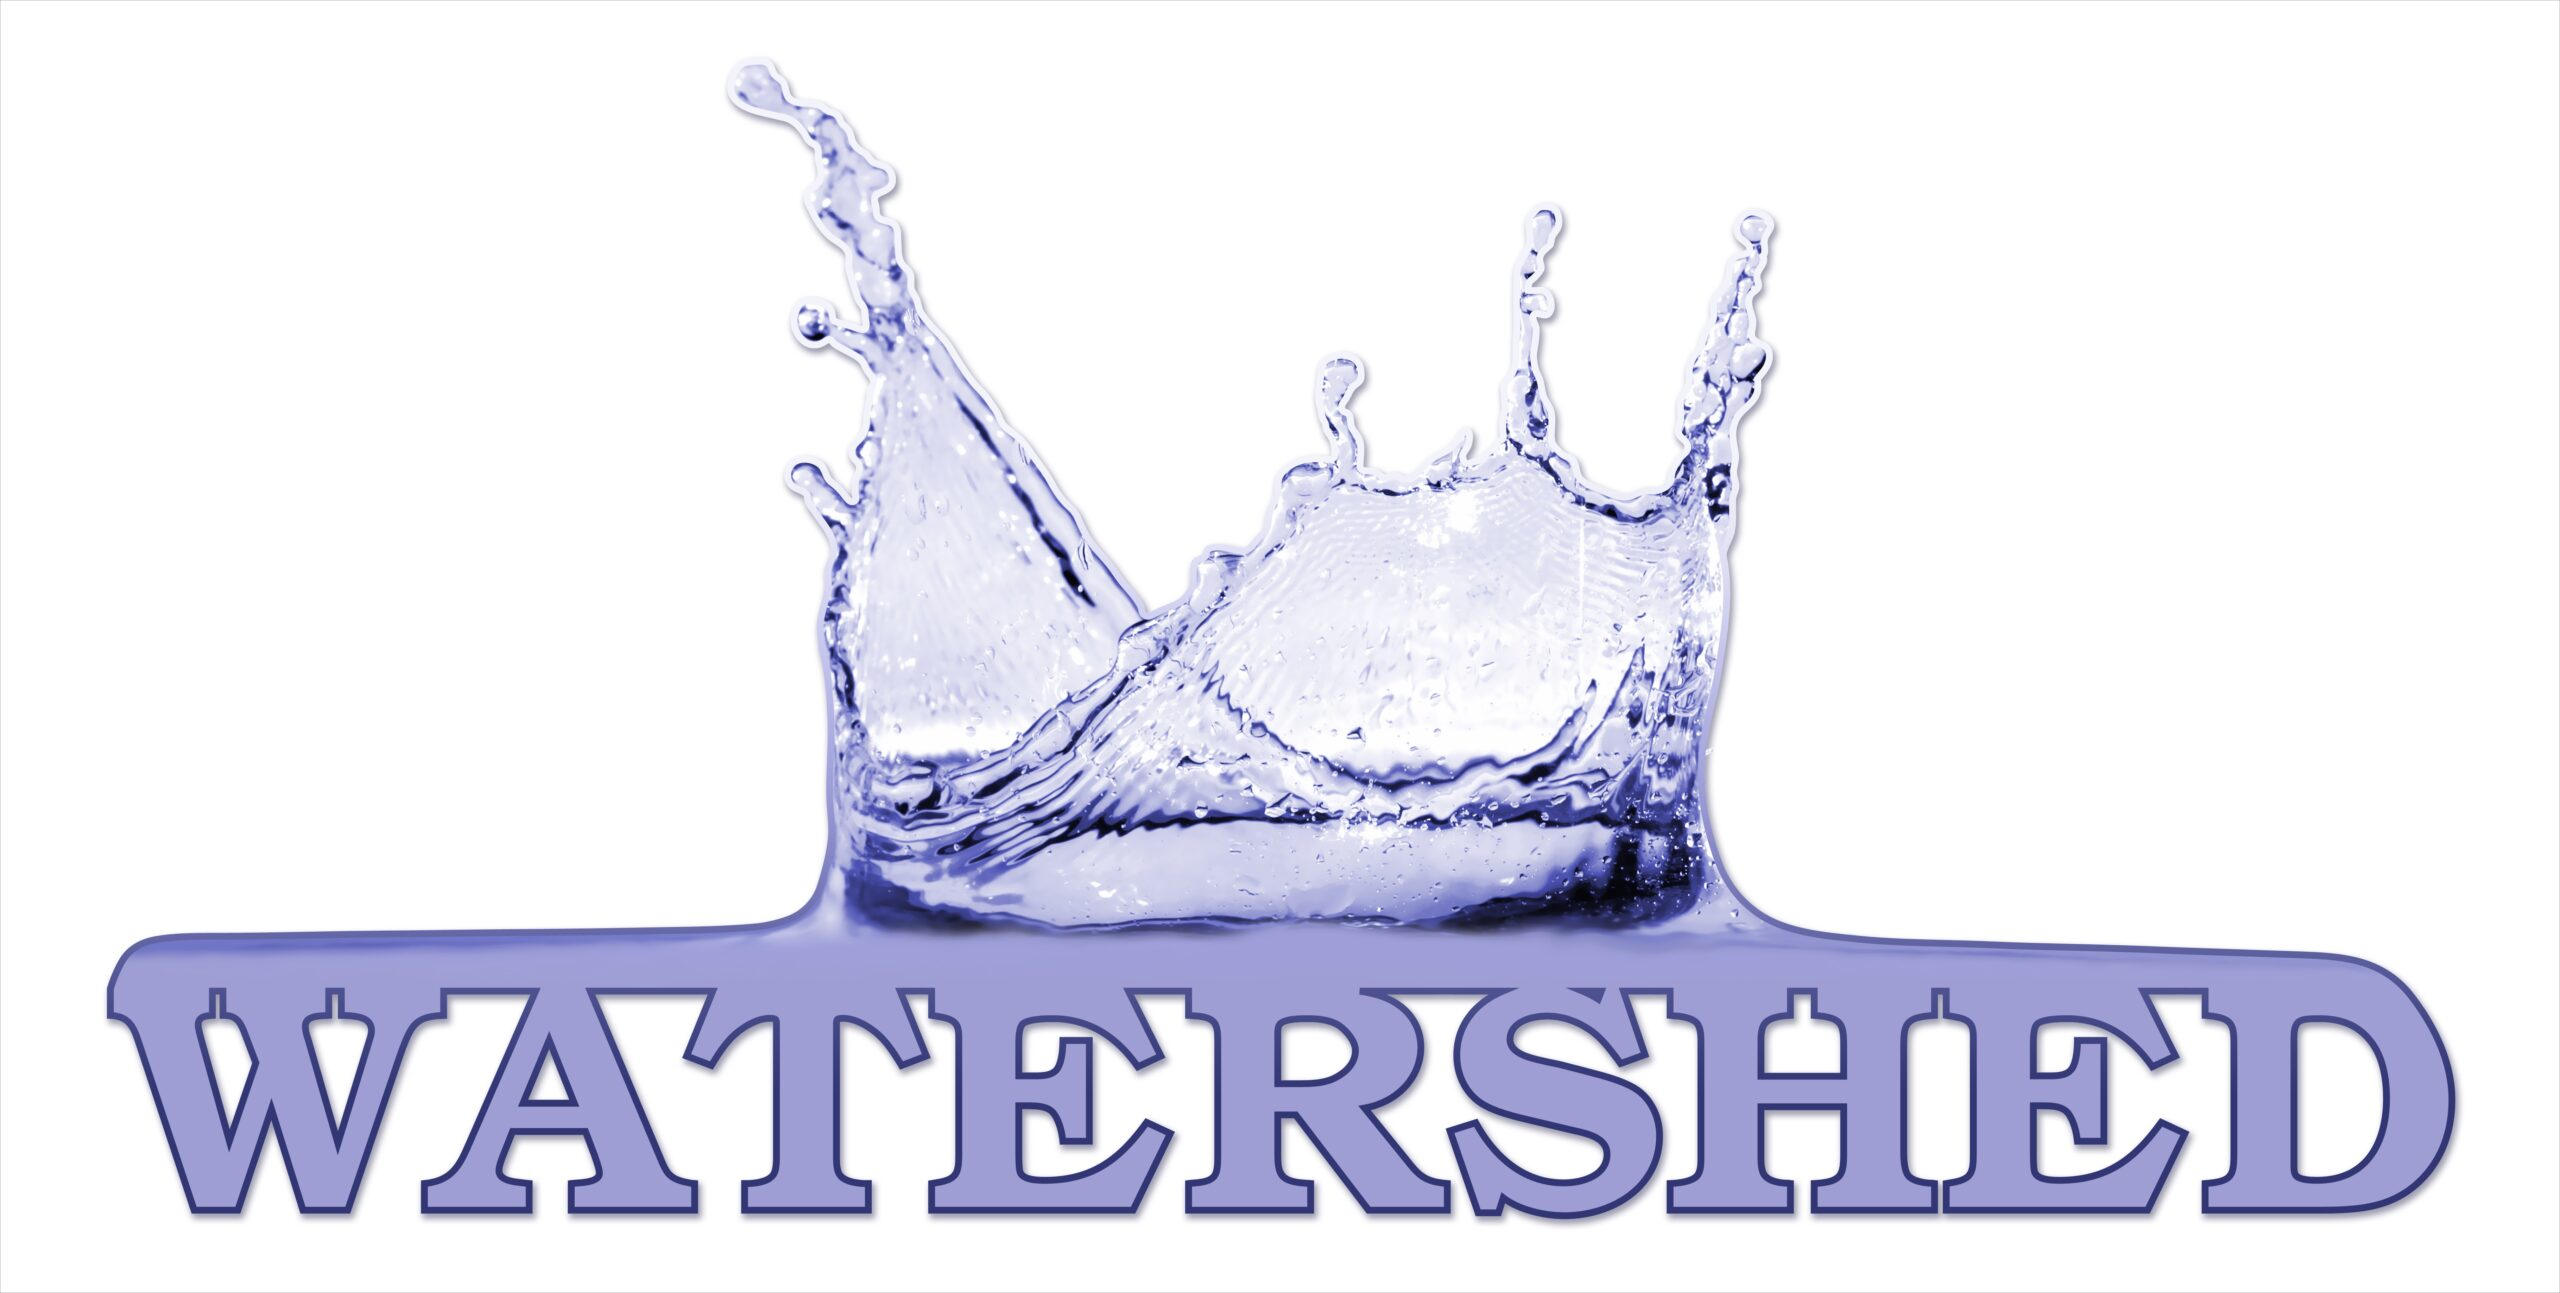 Watershed Security logo